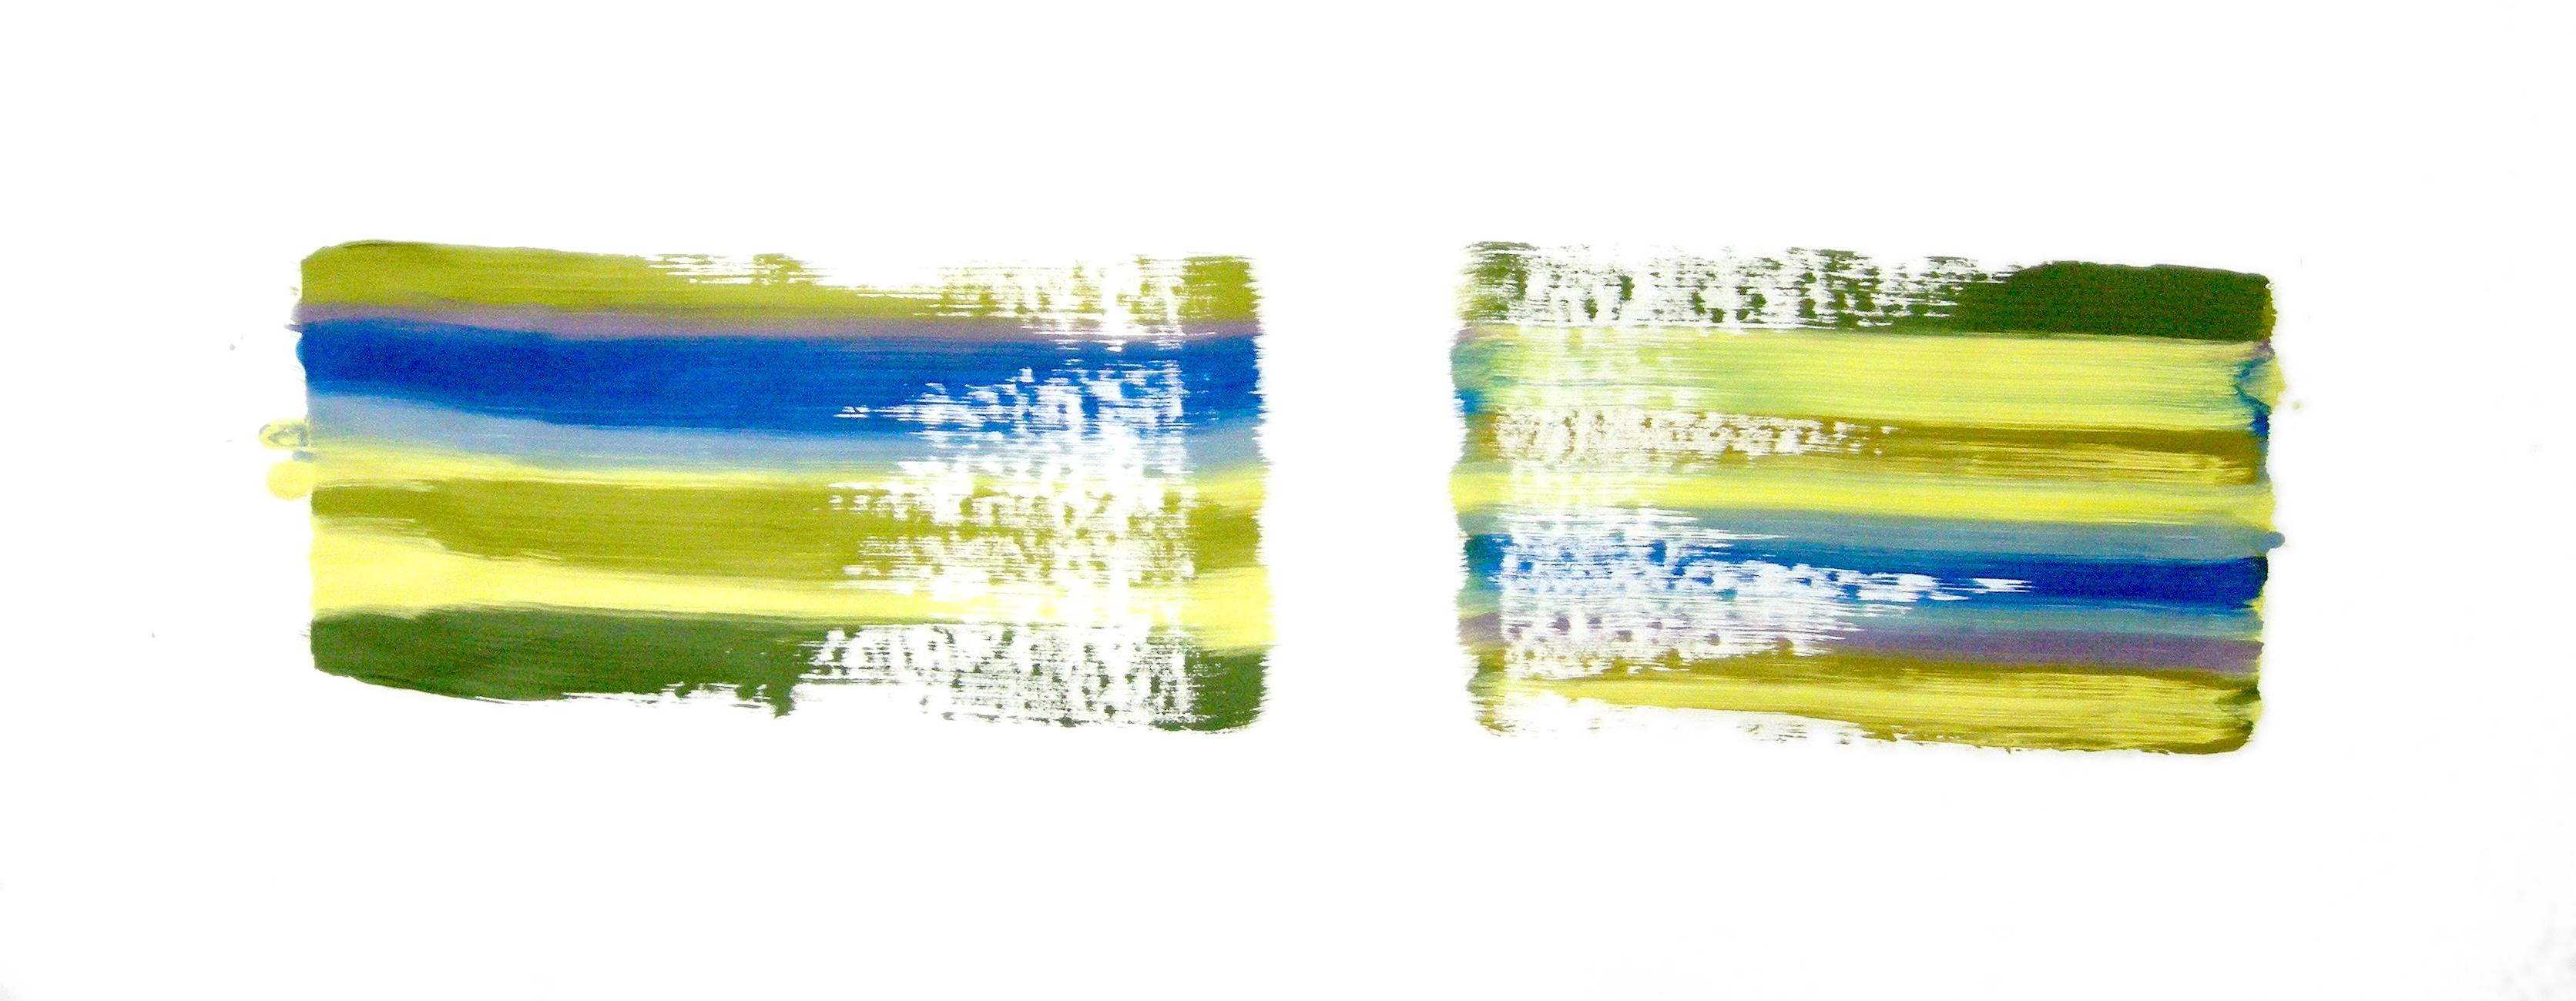 Warren Neidich - Rainbow Brushes